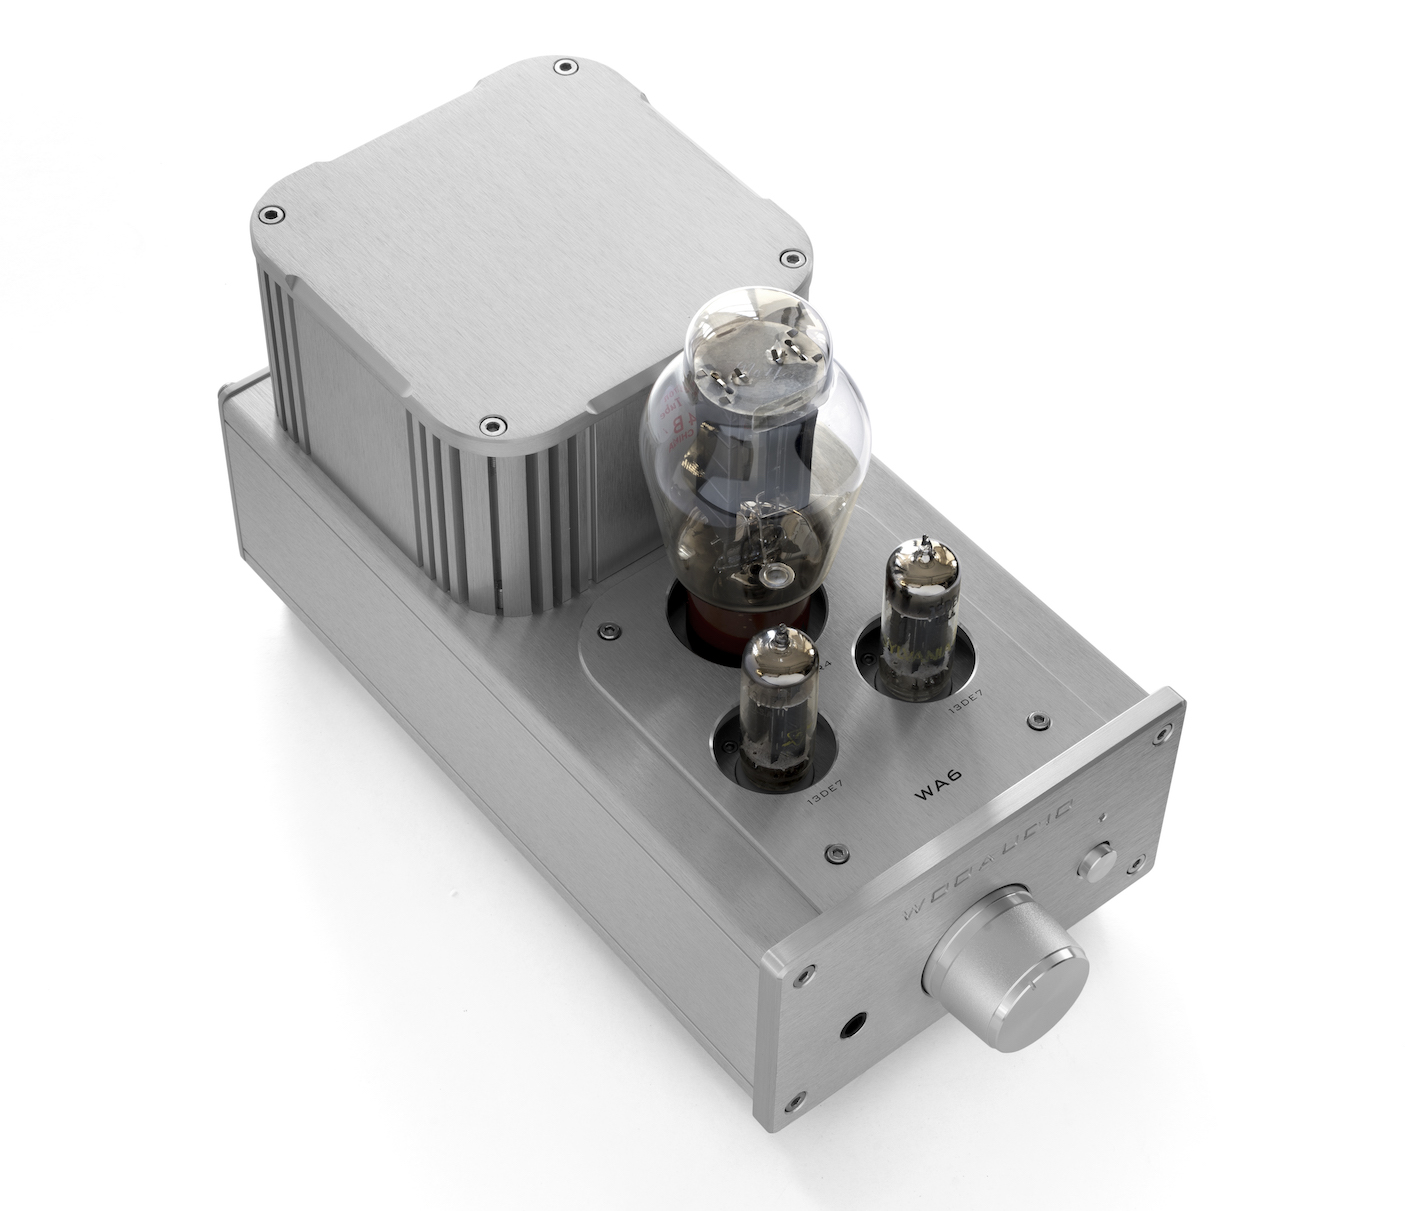 woo-audio-wa6-headphone-amplifier-silver-highend-audiophile-vacuum-tube-headfi-274b-6de7-tubes-preamplifier